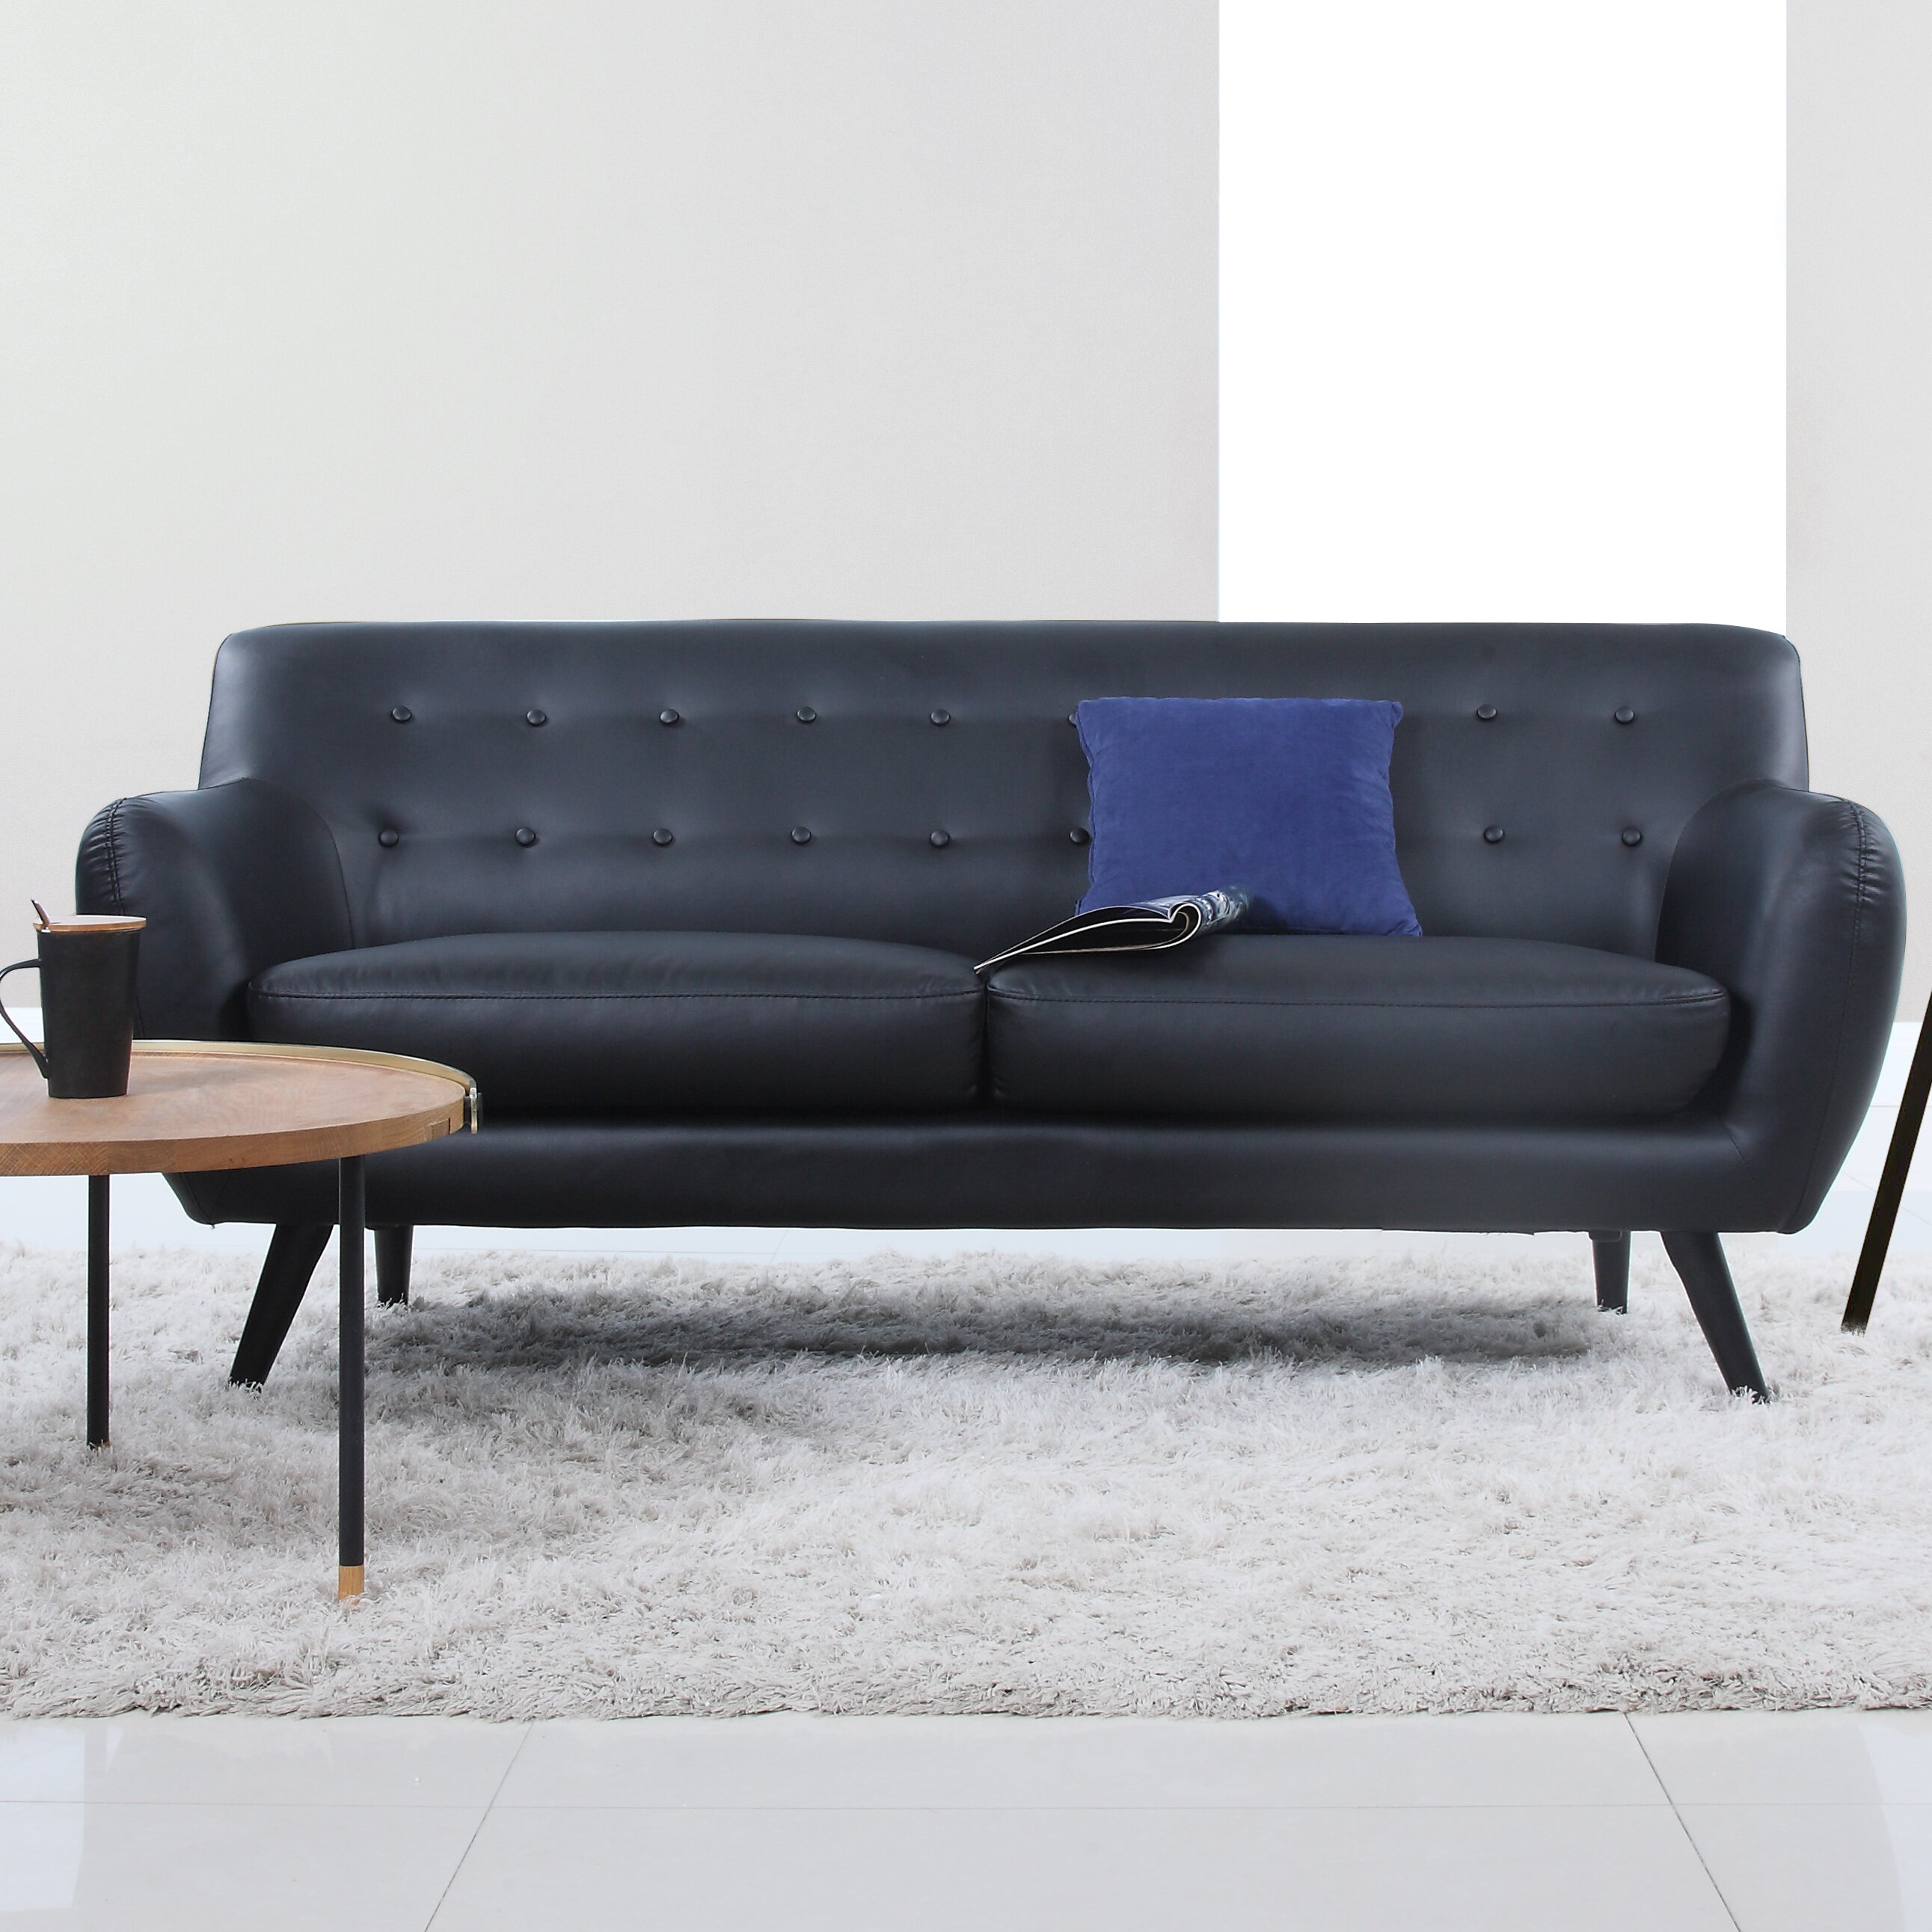 madison home usa mid century modern tufted sofa reviews. Black Bedroom Furniture Sets. Home Design Ideas